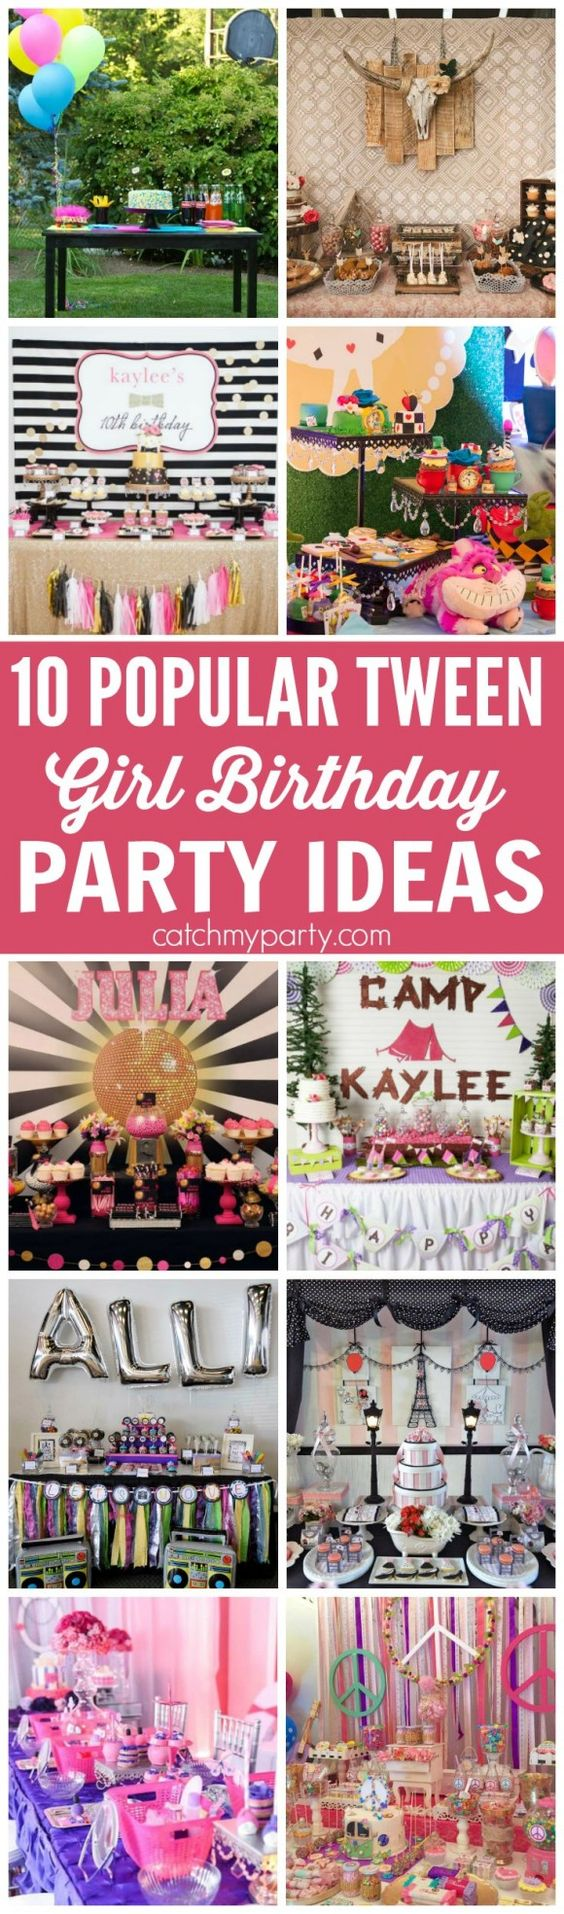 10 Popular Tween Girl Birthday Party Ideas